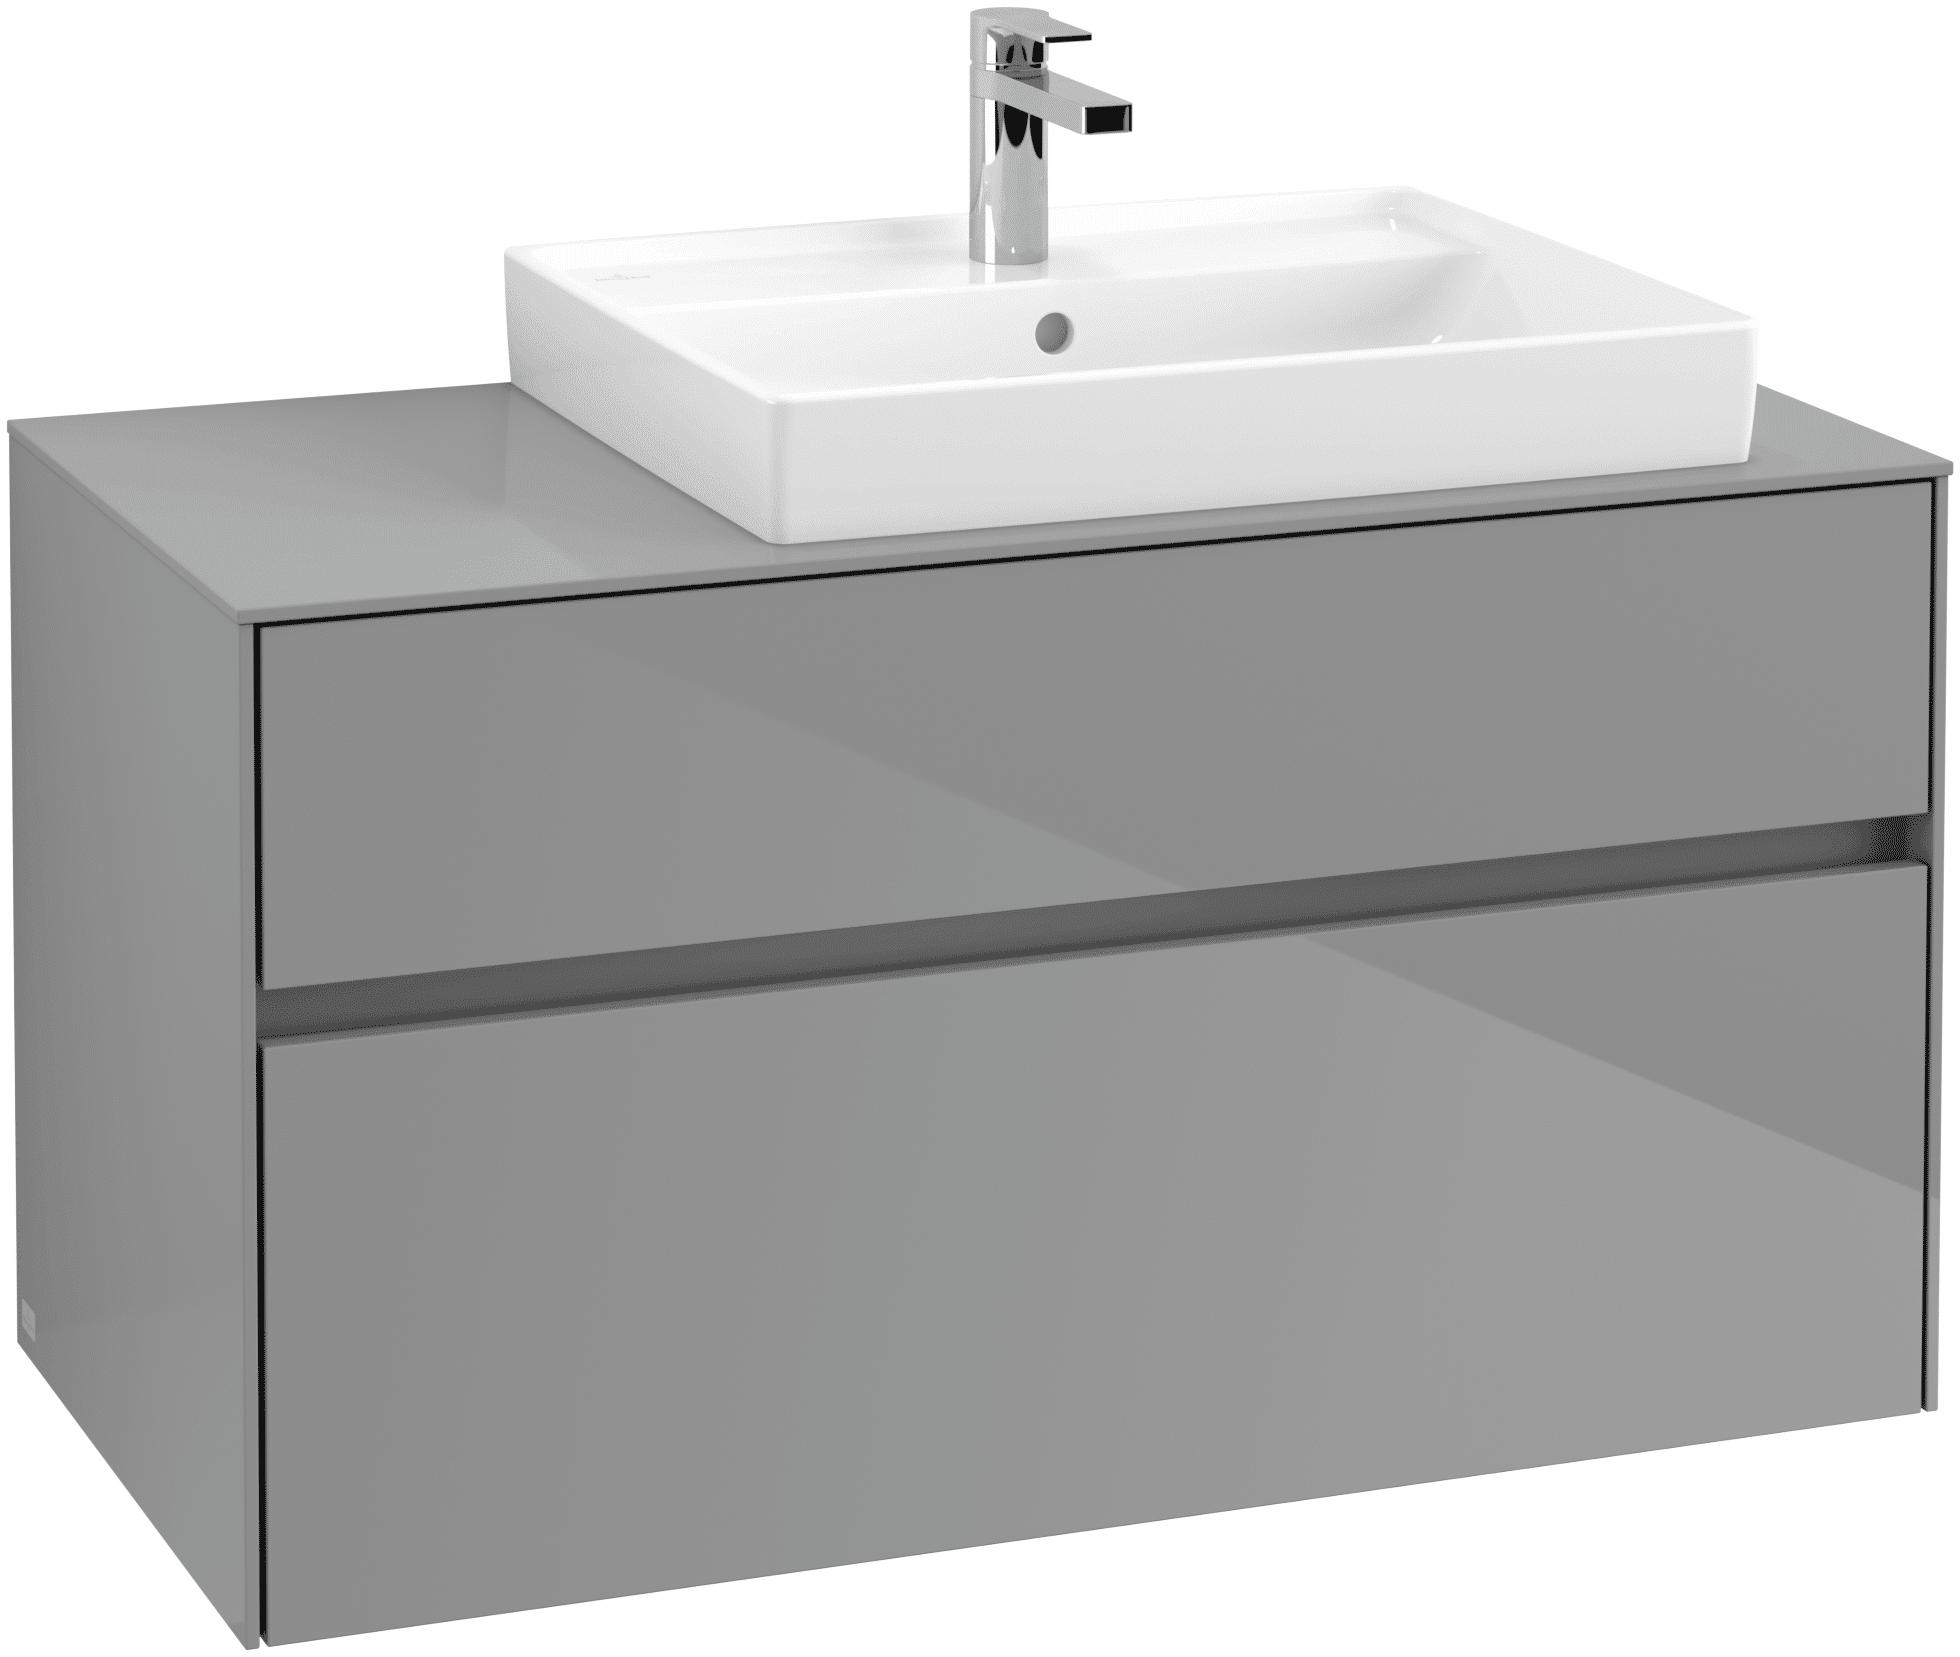 Villeroy & Boch Villeroy & Boch Collaro - Meuble sous lavabo with 2 drawers & 1 cut-out right 1000 x 548 x 500mm gris lustré